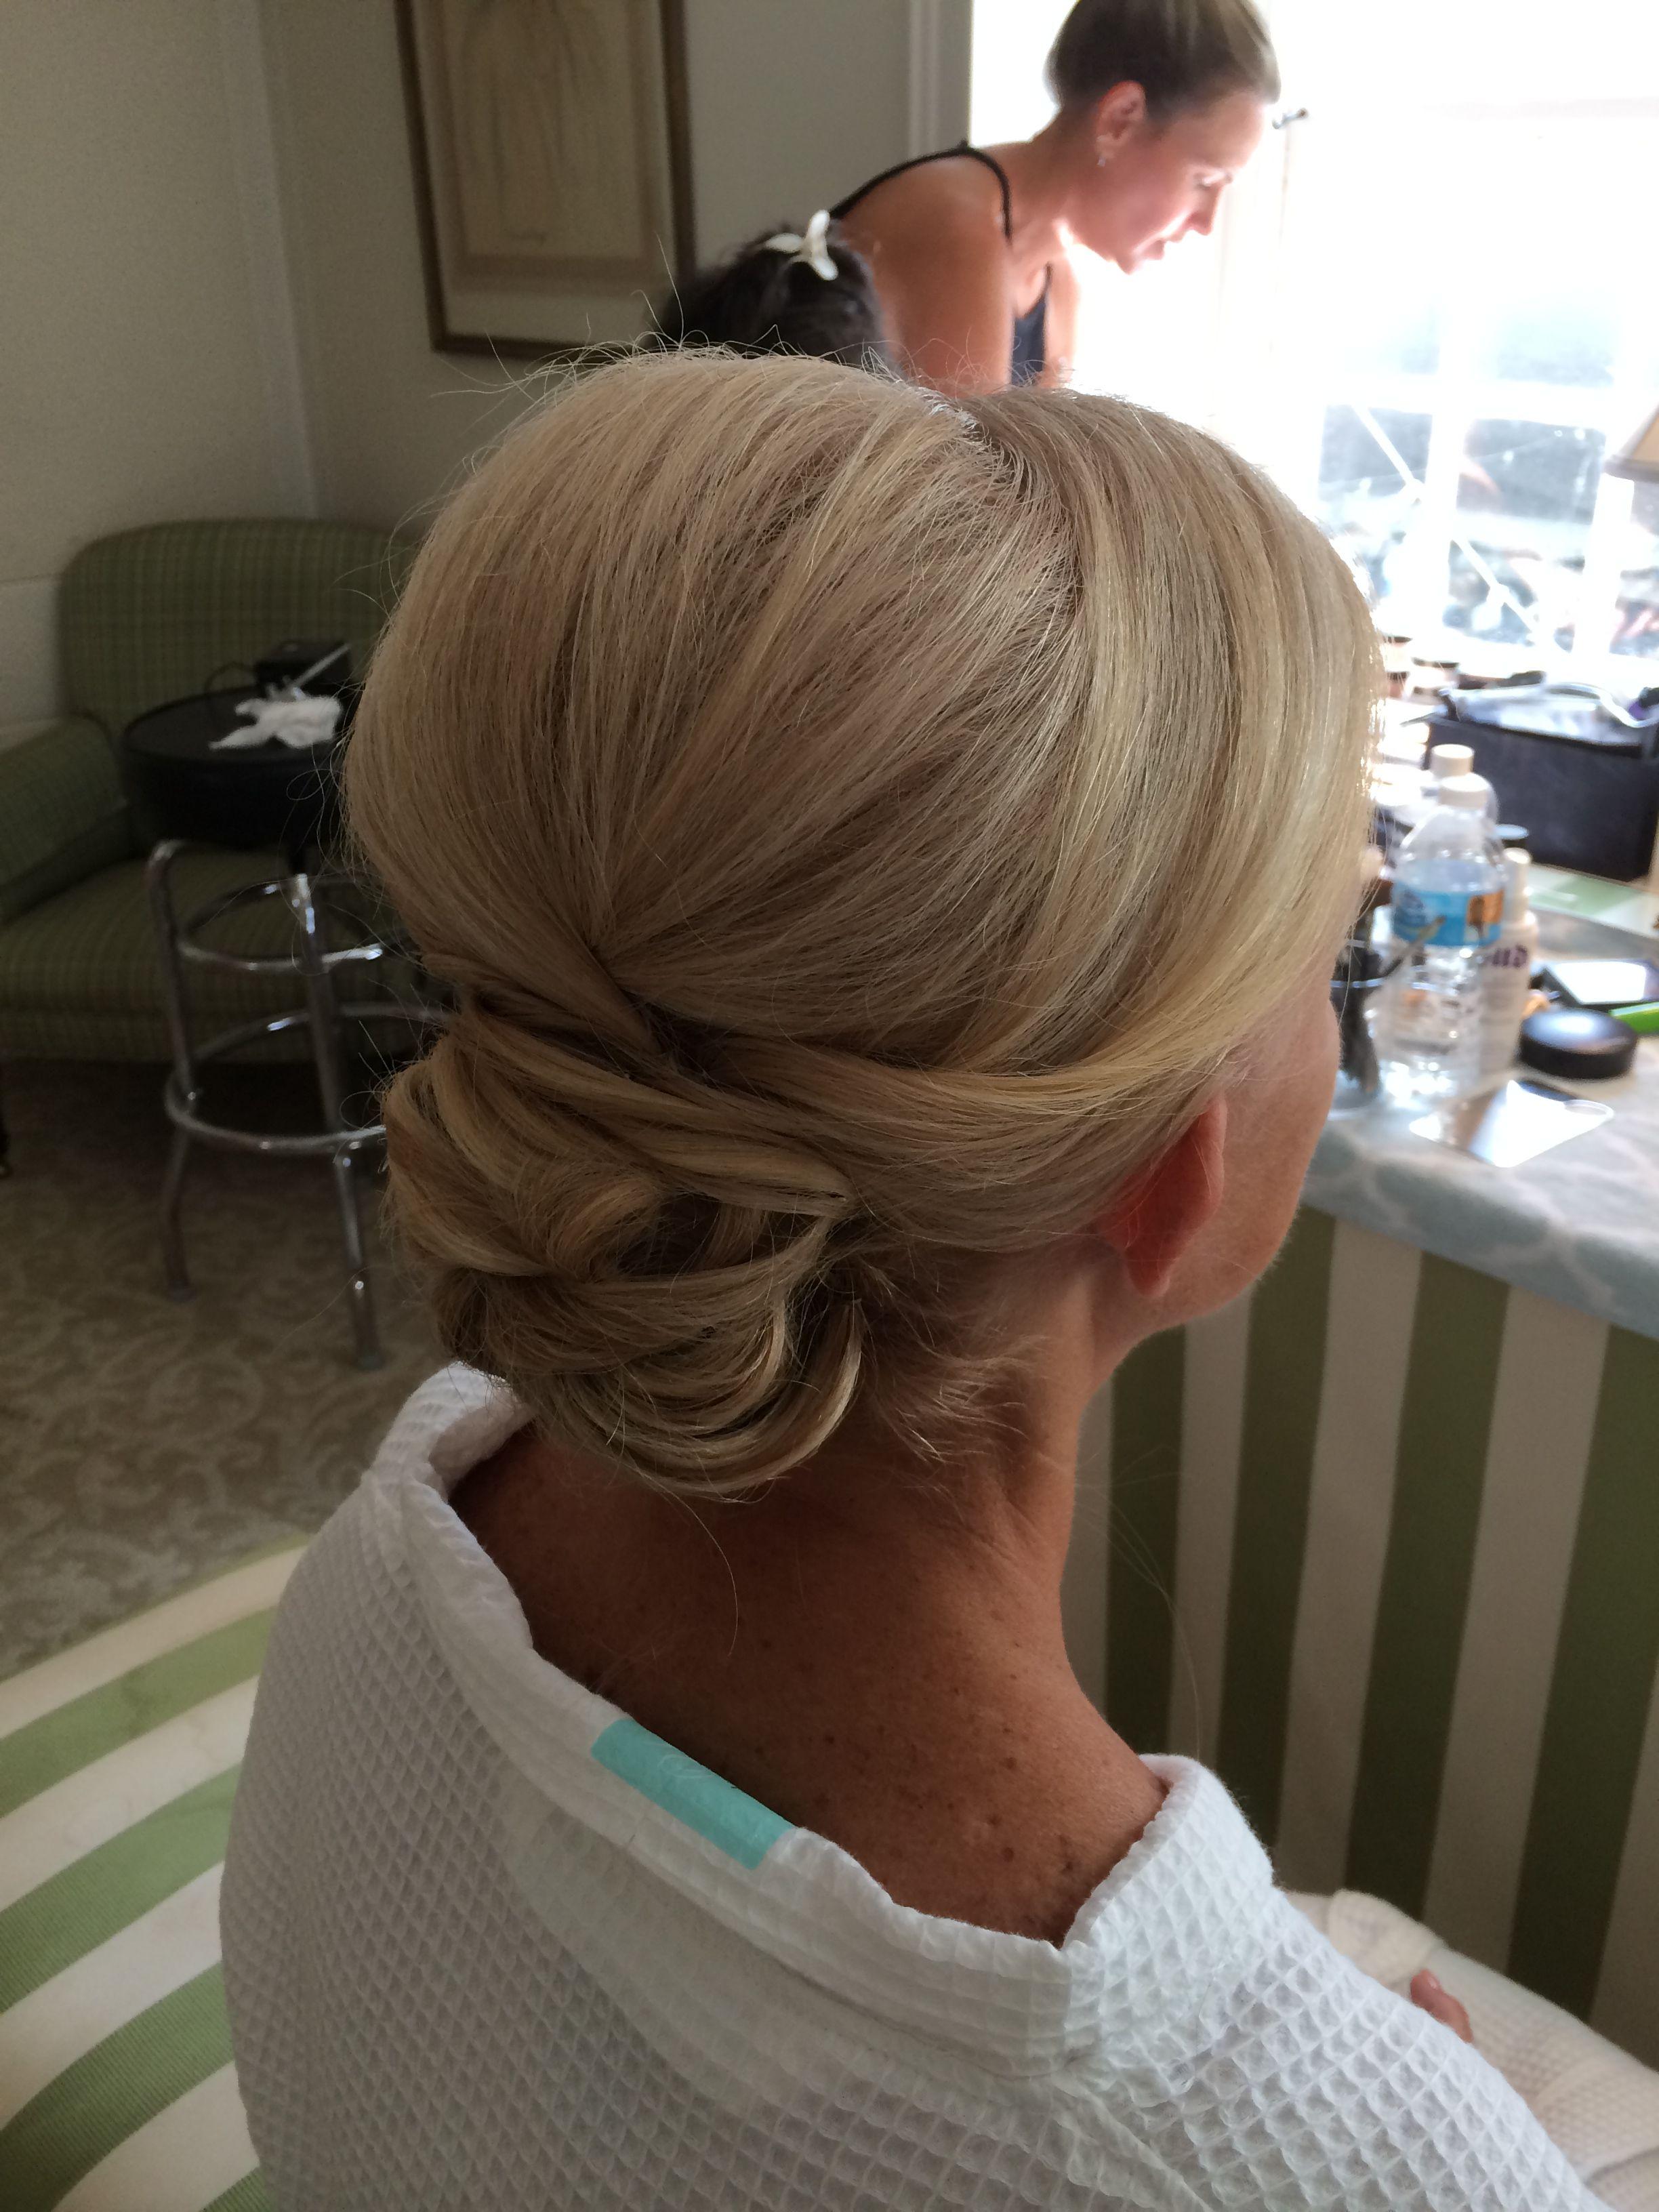 Phenomenal Mob Updo By Kimberly Valosen Kim Pinterest Updo Wedding And Mom Hairstyle Inspiration Daily Dogsangcom